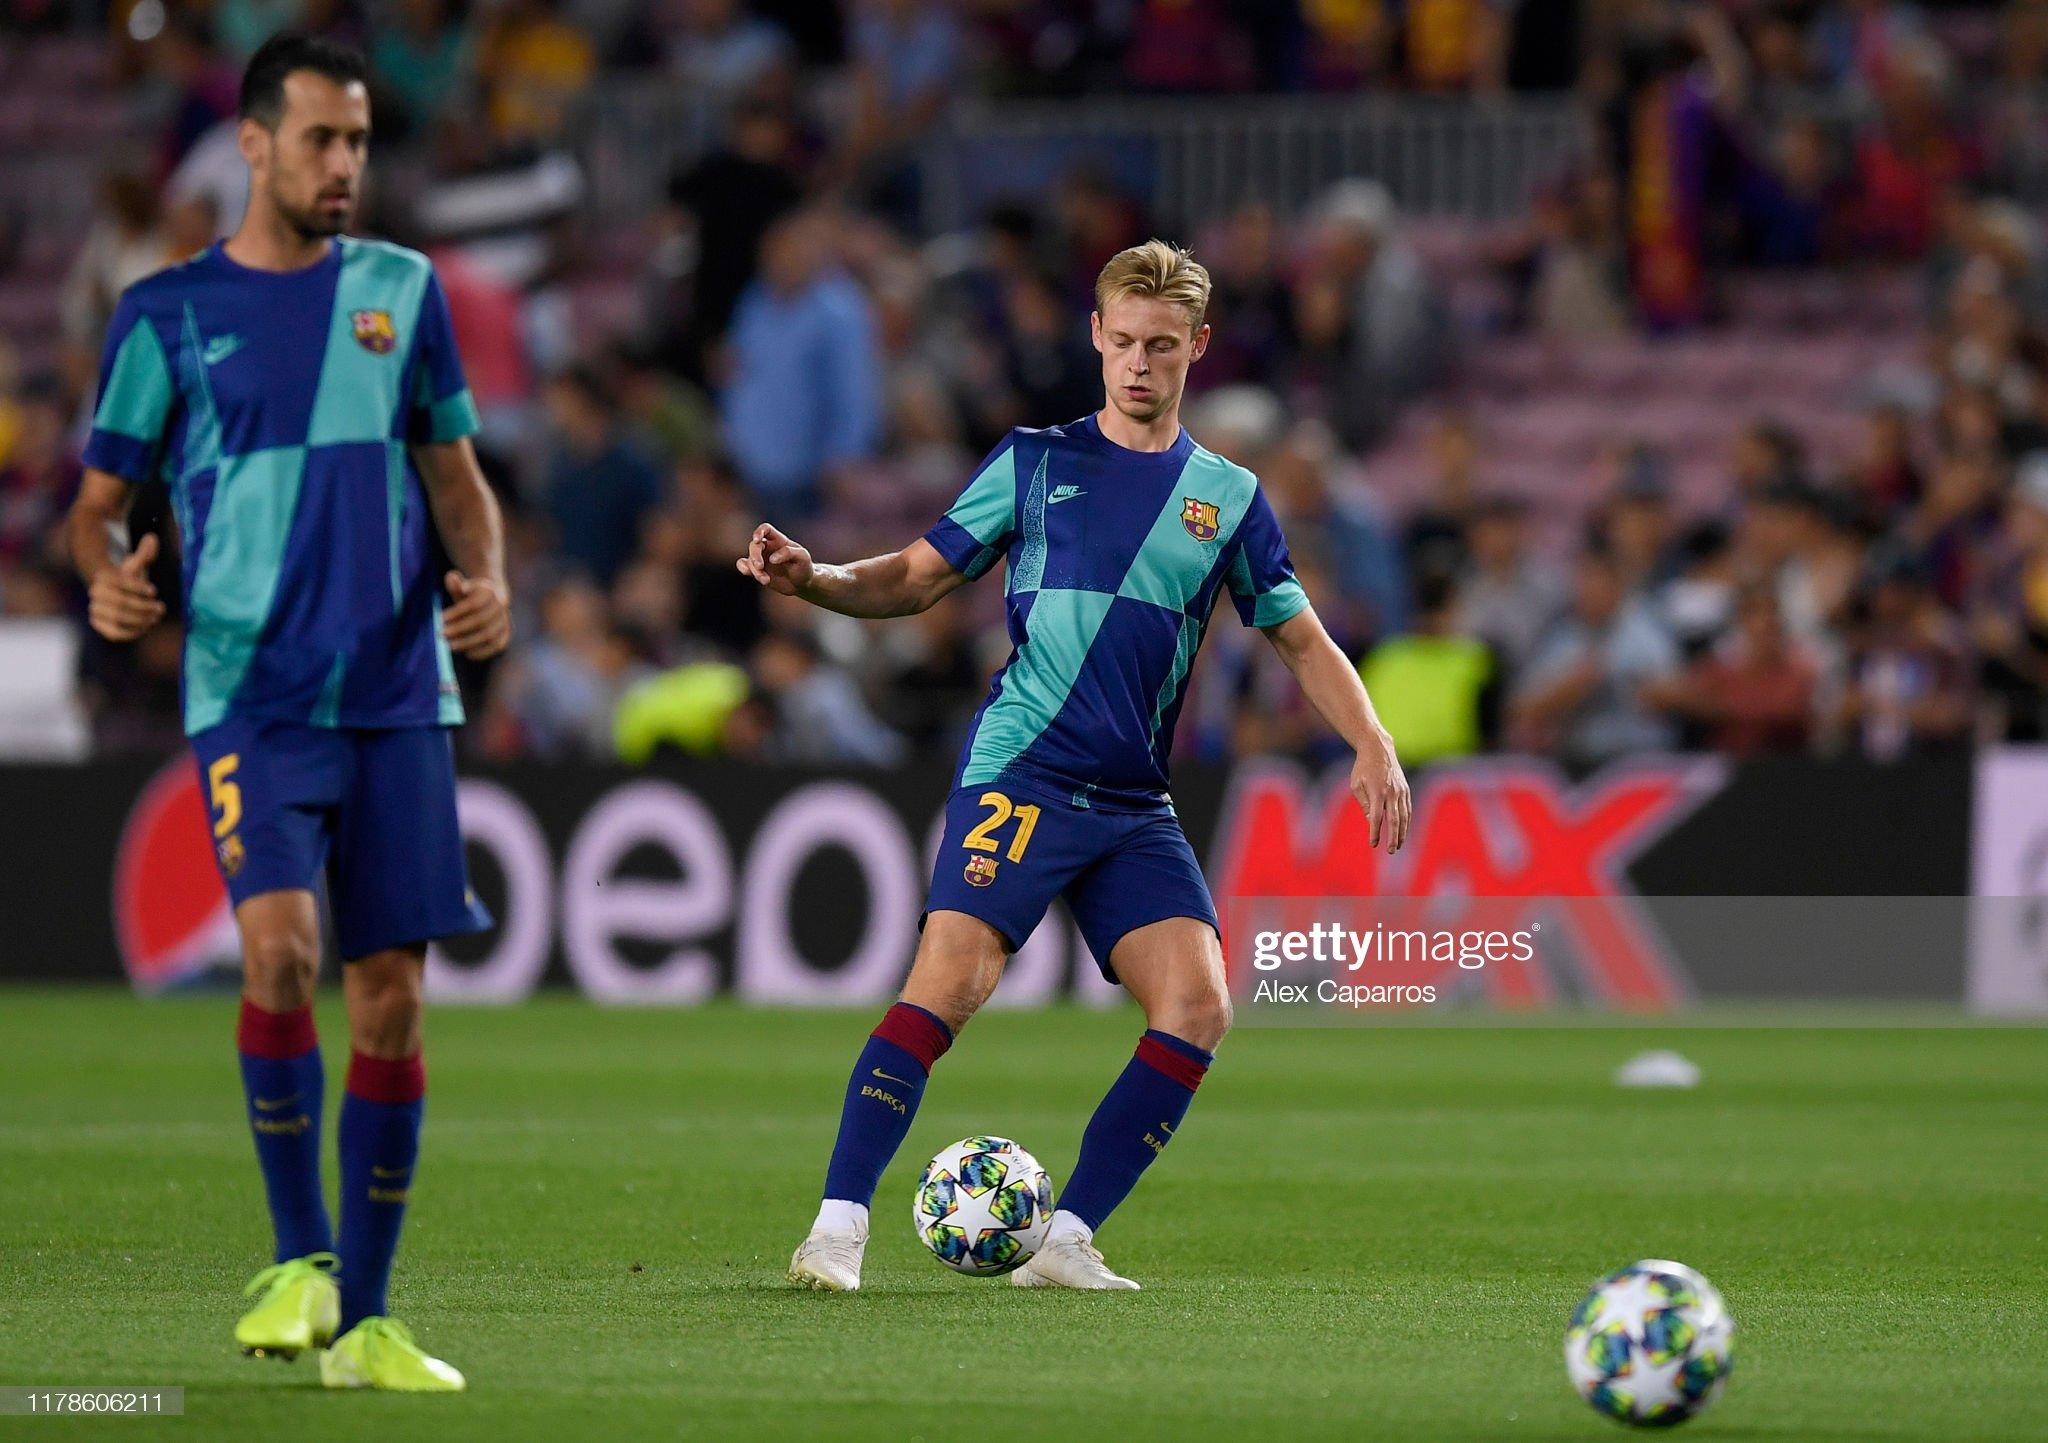 صور مباراة : برشلونة - إنتر 2-1 ( 02-10-2019 )  Frankie-de-jong-of-fc-barcelona-warms-up-prior-to-the-uefa-champions-picture-id1178606211?s=2048x2048